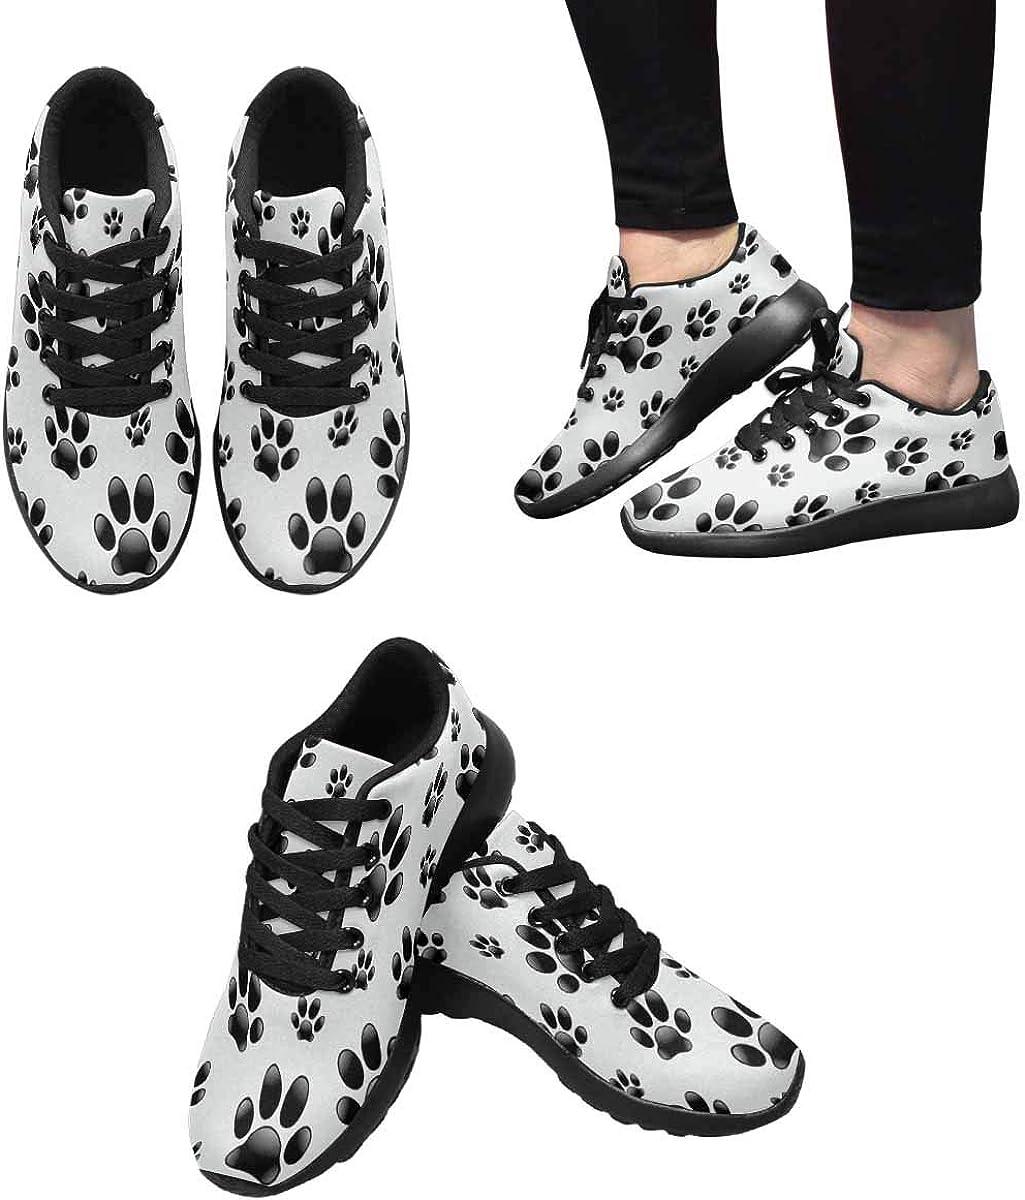 InterestPrint Womens Jogging Sneakers Outdoor Sport Cross Training Shoes Dog's Footprints Pattern